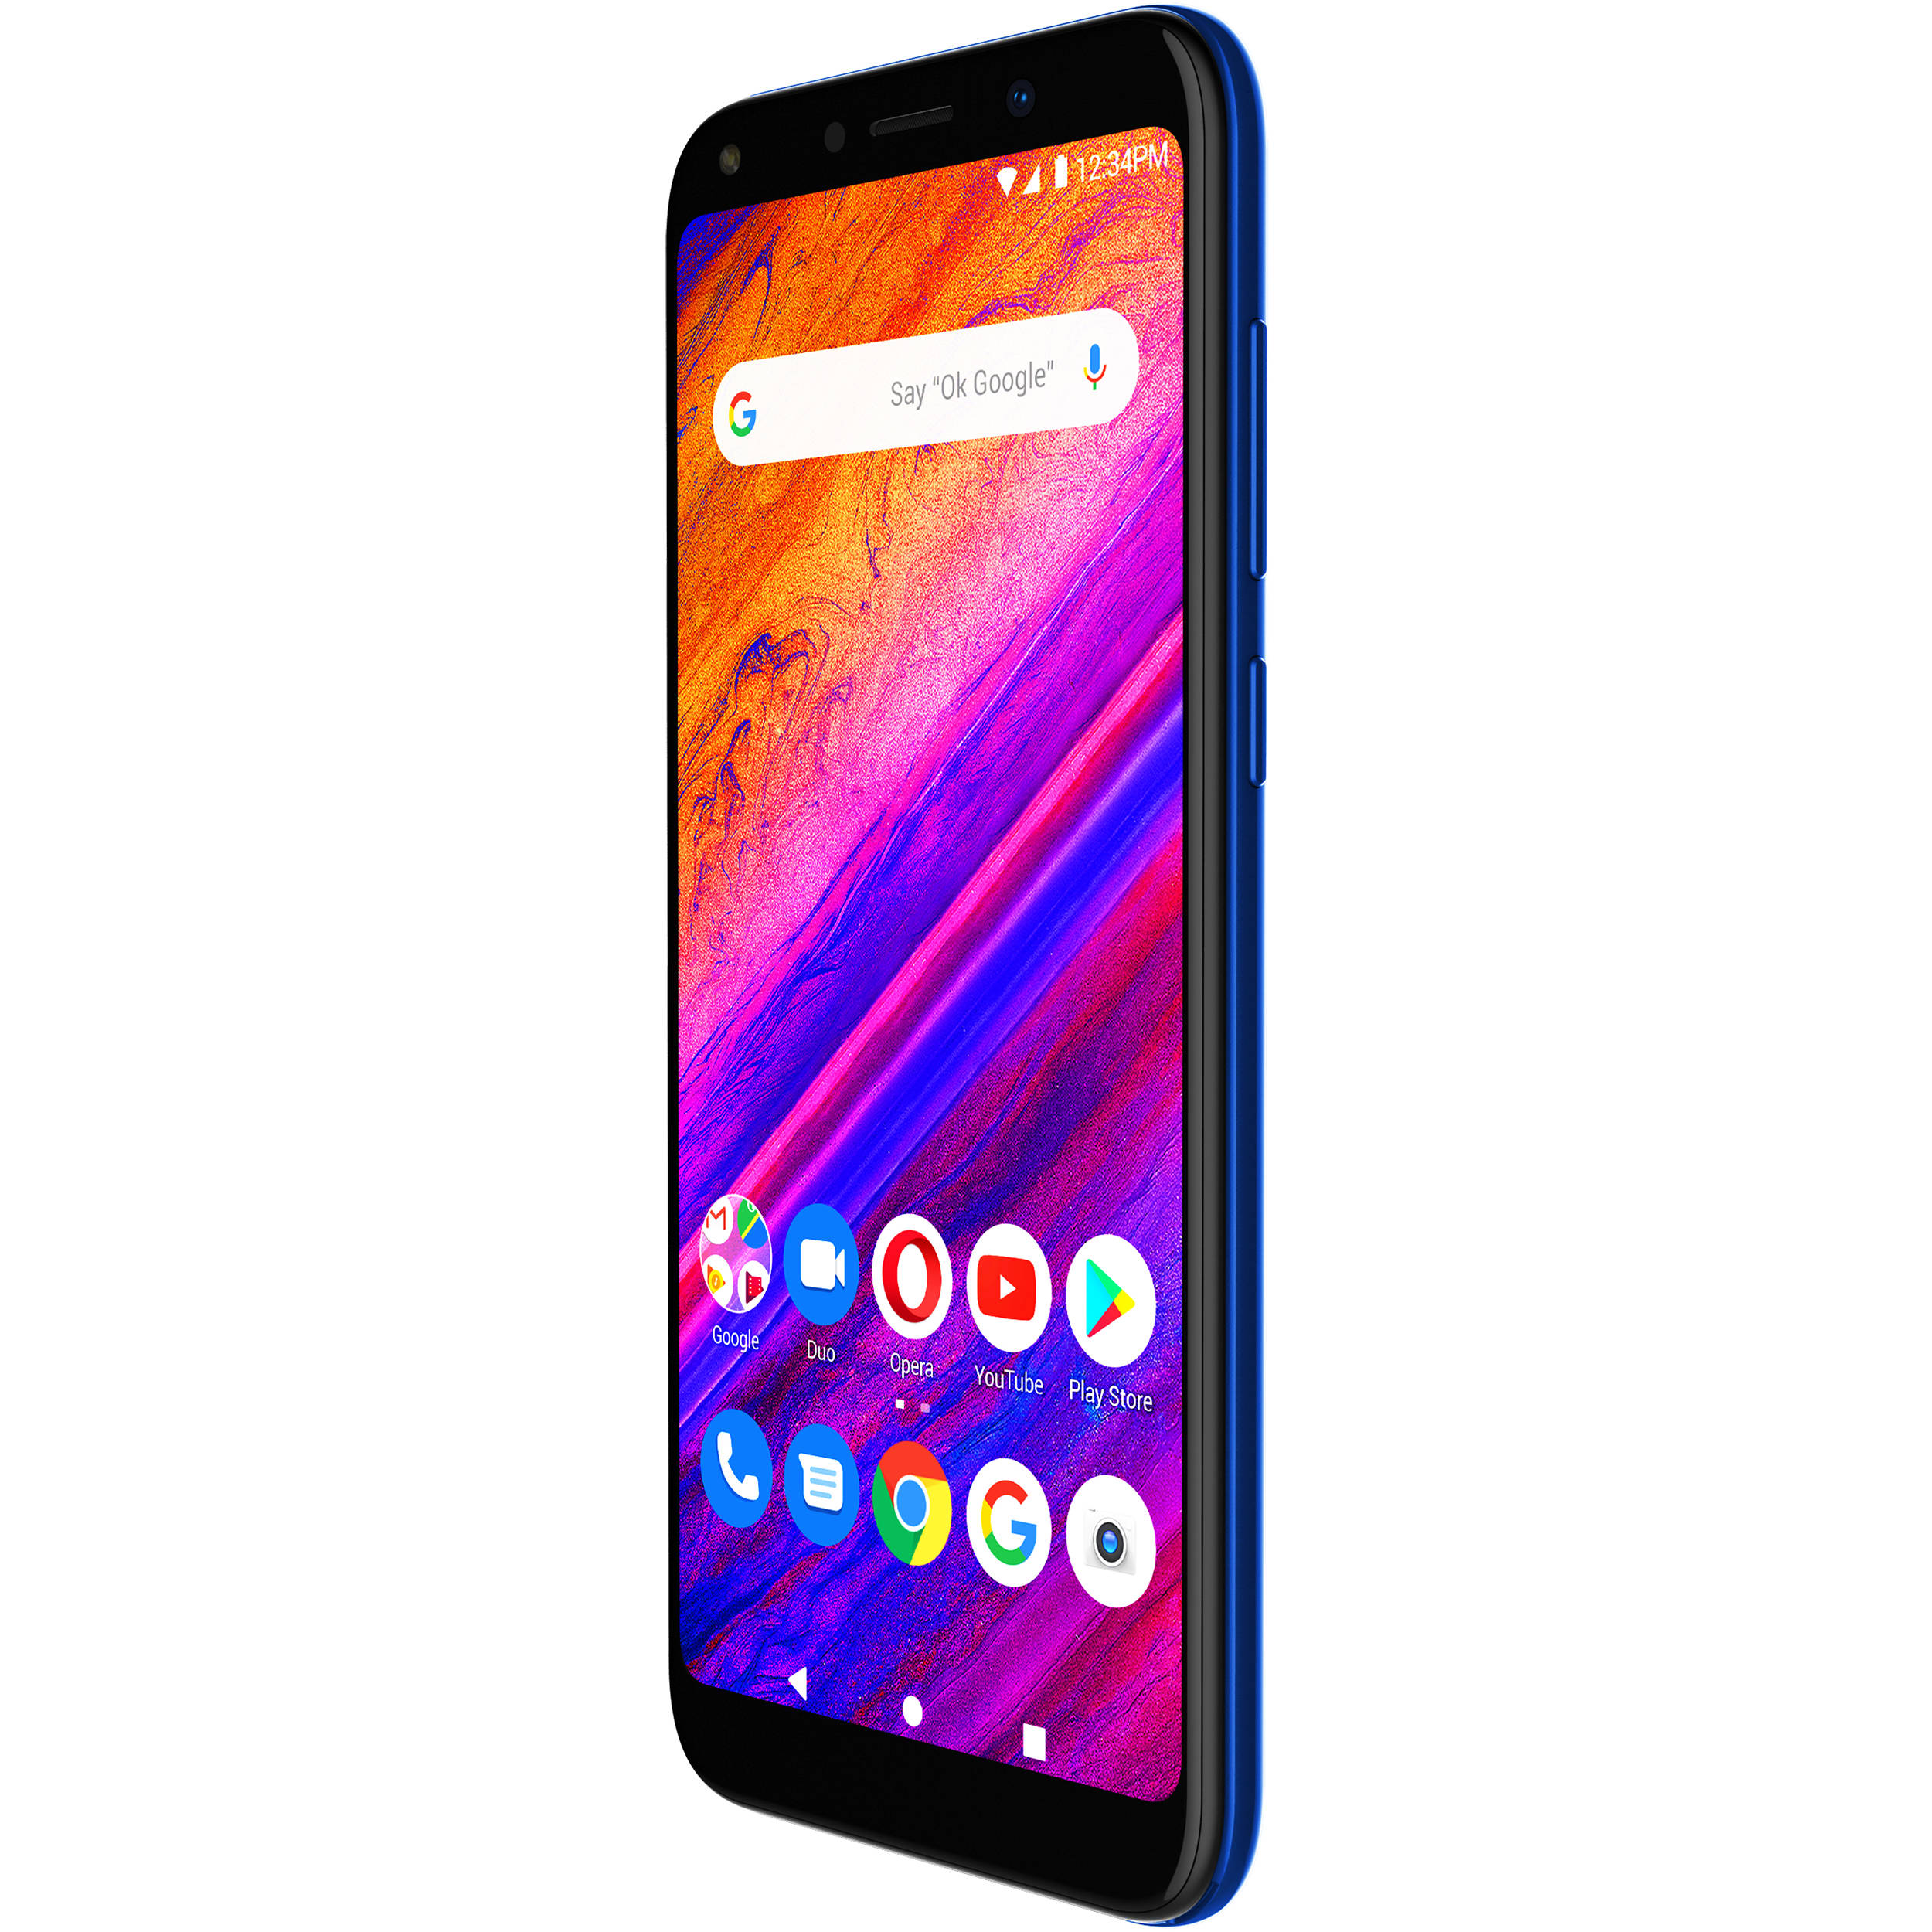 BLU G6 G0210UU Dual-SIM 64GB Smartphone (Black)